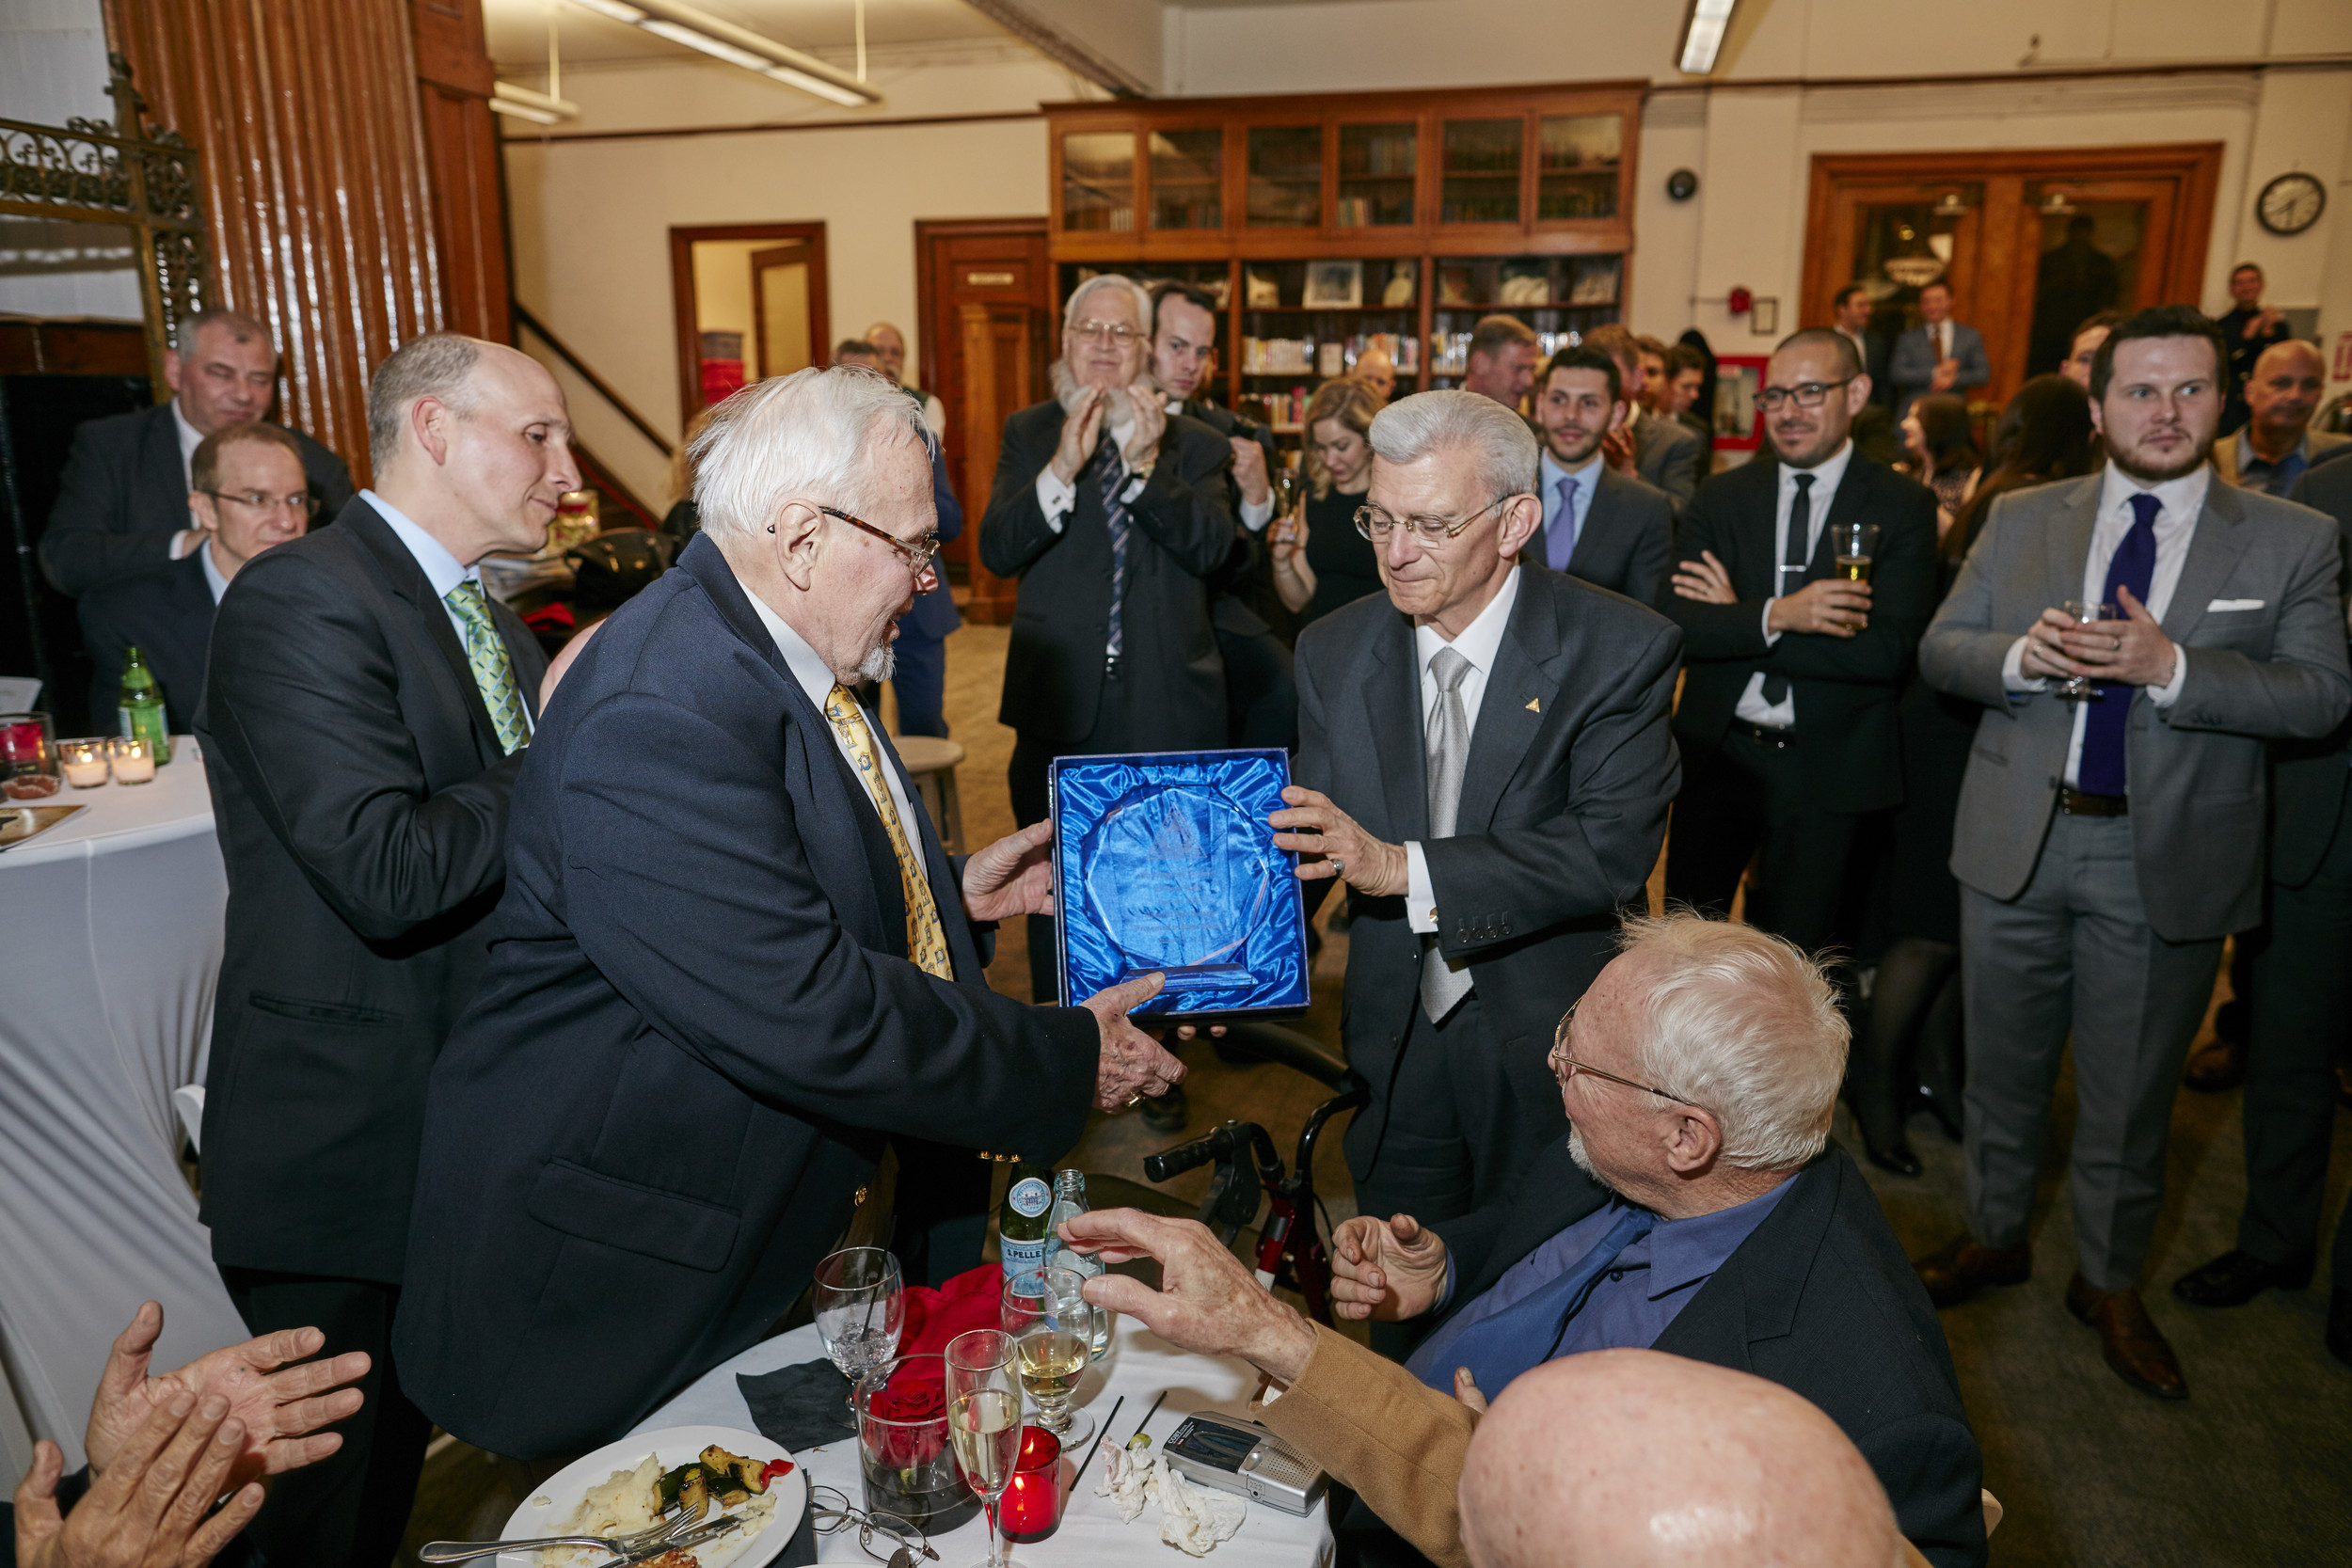 Charles Salomon, HSNY Treasurer & Fellow, presenting the Howard Fass Award to Hans Weber, HSNY Trustee & Fellow